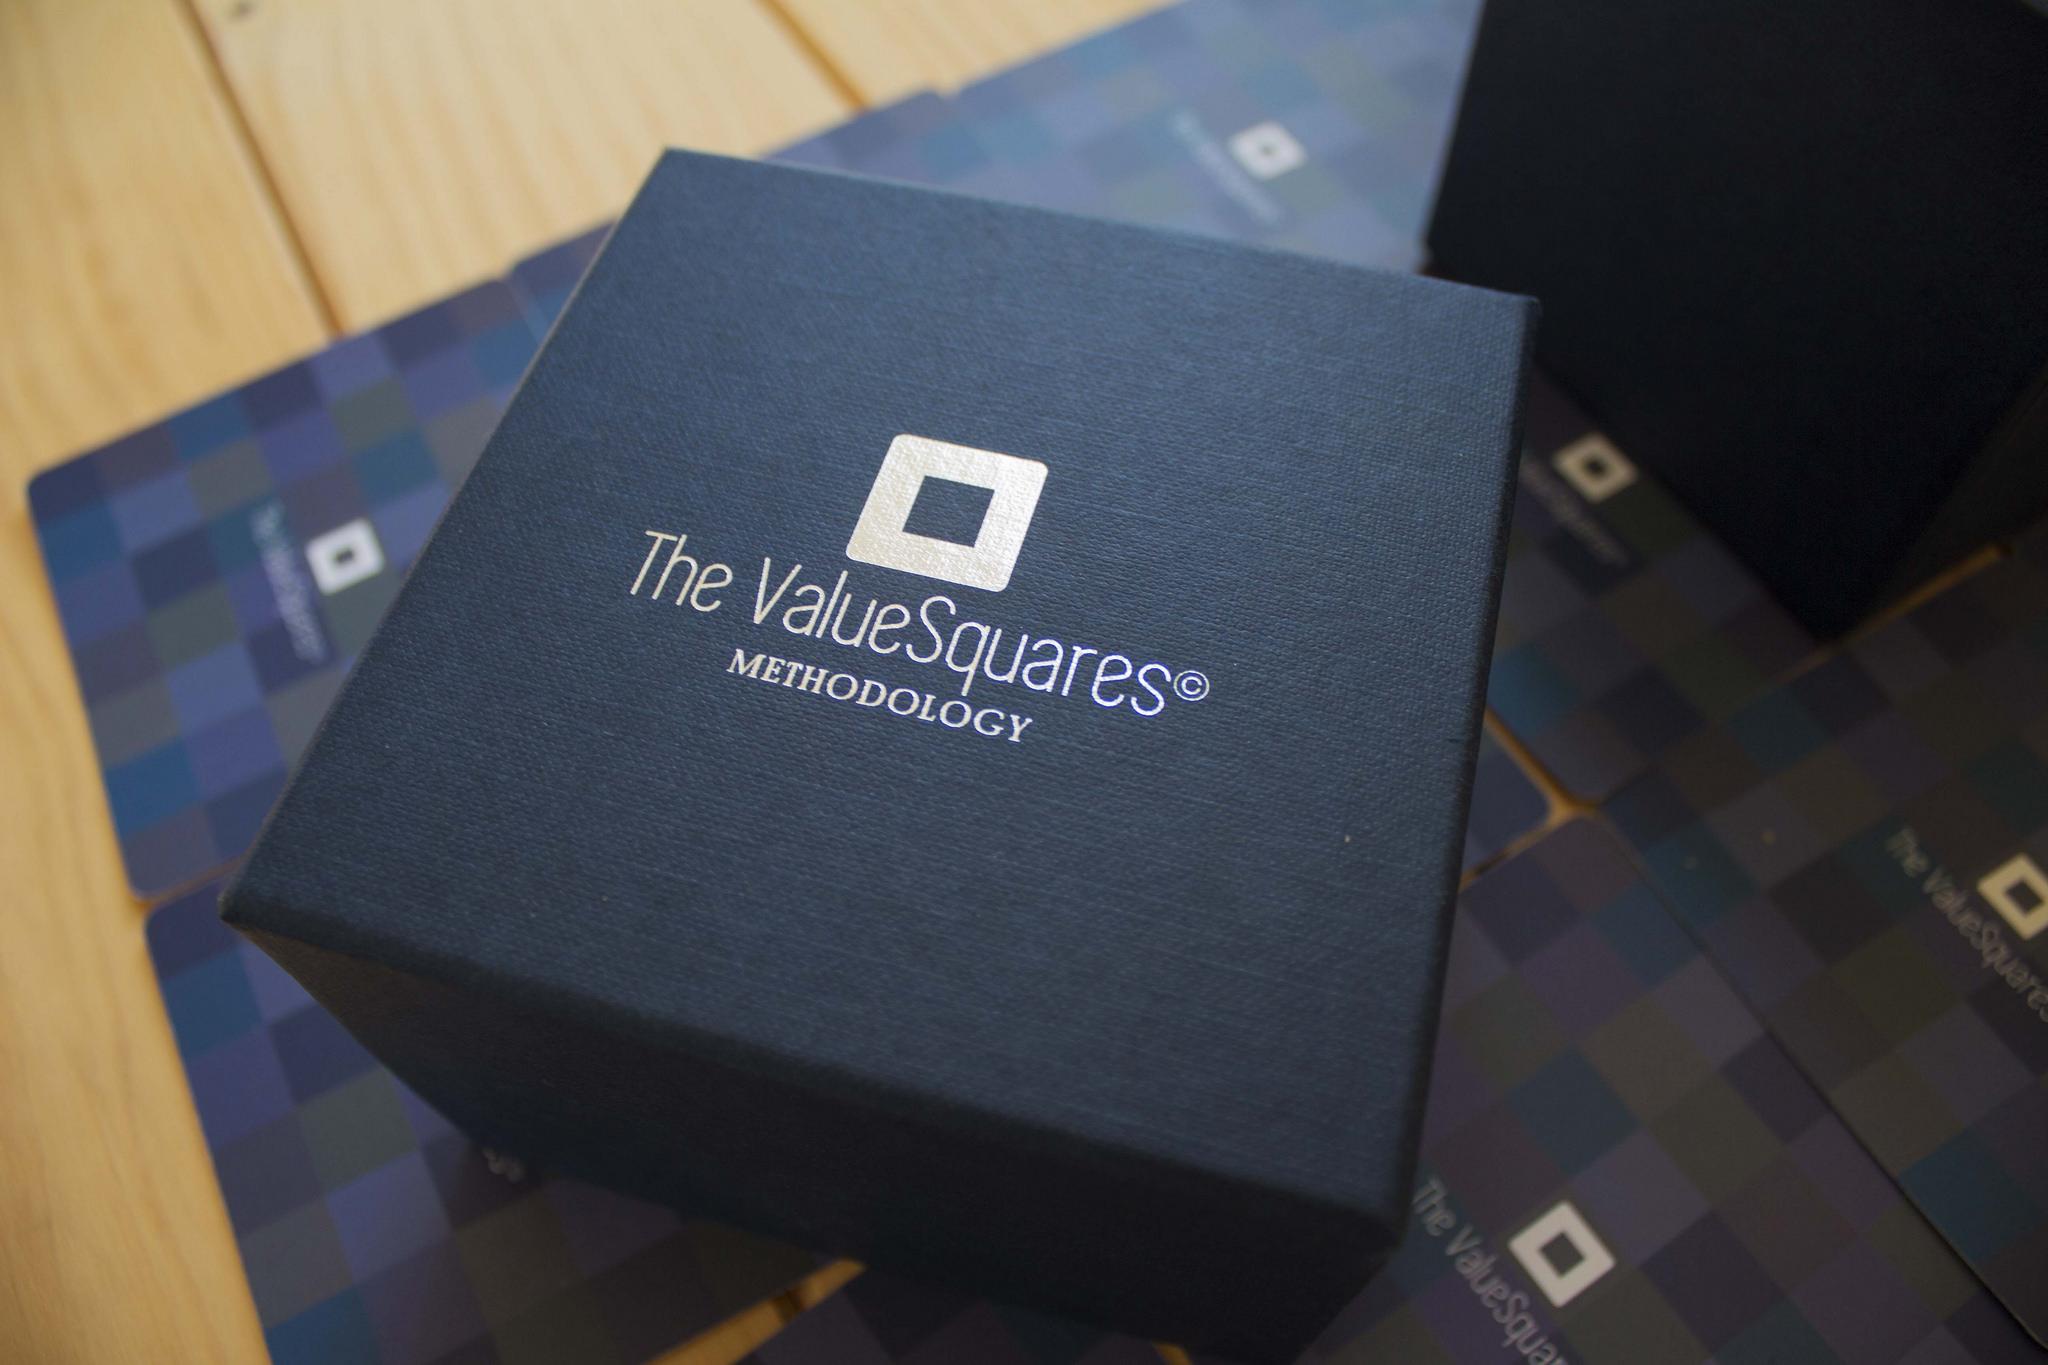 caja herramienta para trabajar valores 3